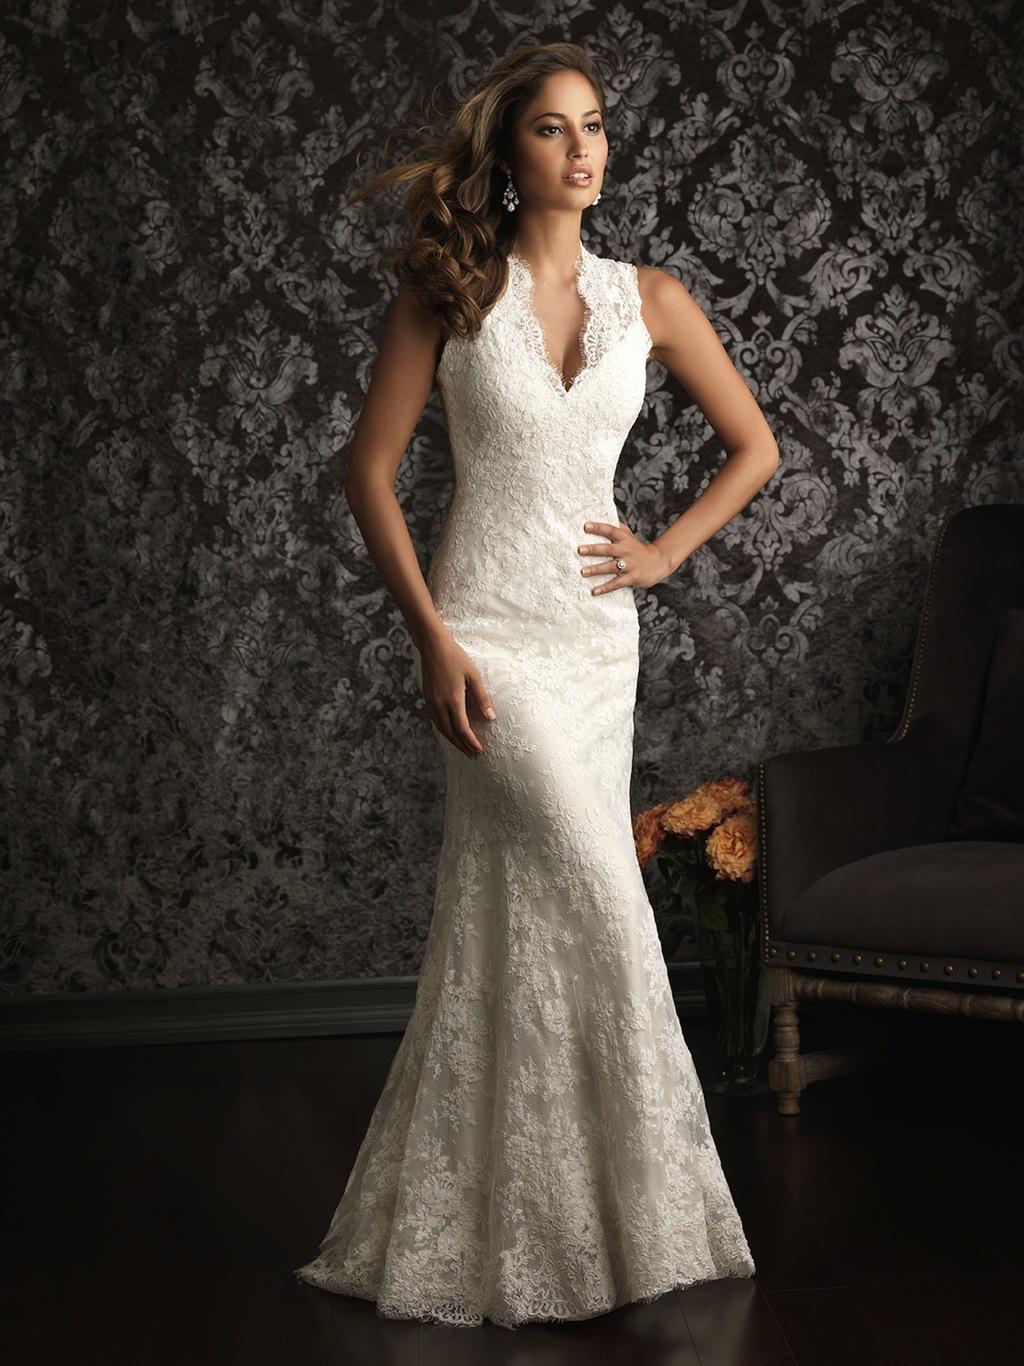 Allure Wedding Gowns 009 - Allure Wedding Gowns